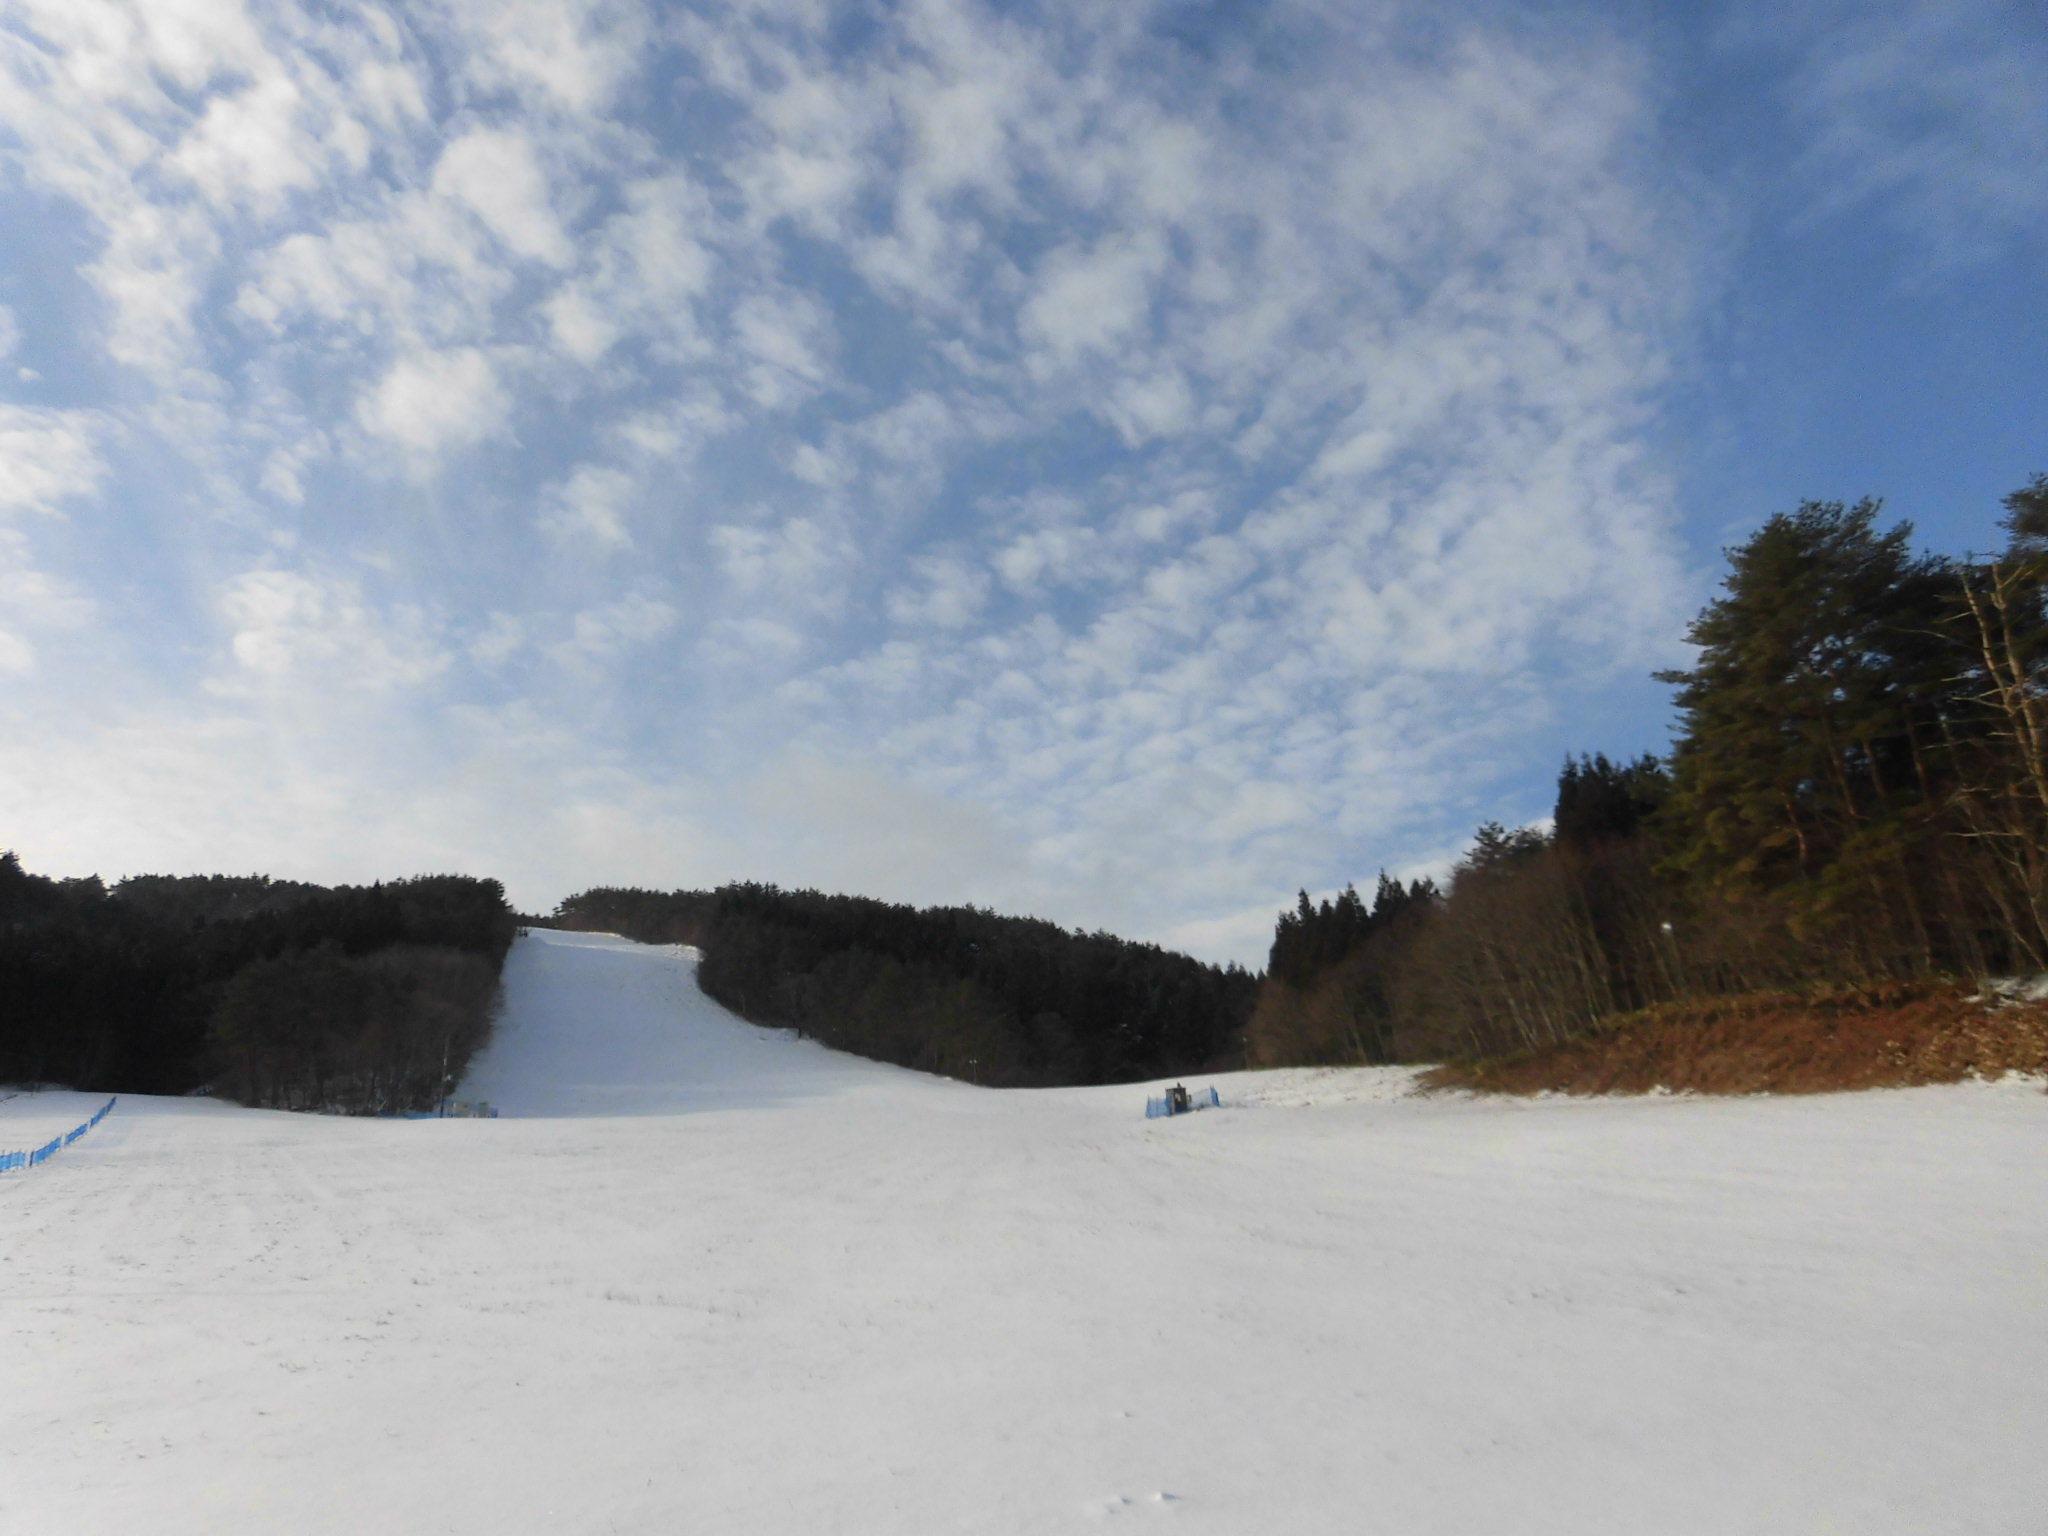 令和元年12月30日(月)天気:くもり 気温:-3℃ 積雪:5cm 滑走不能_e0306207_09192479.jpg